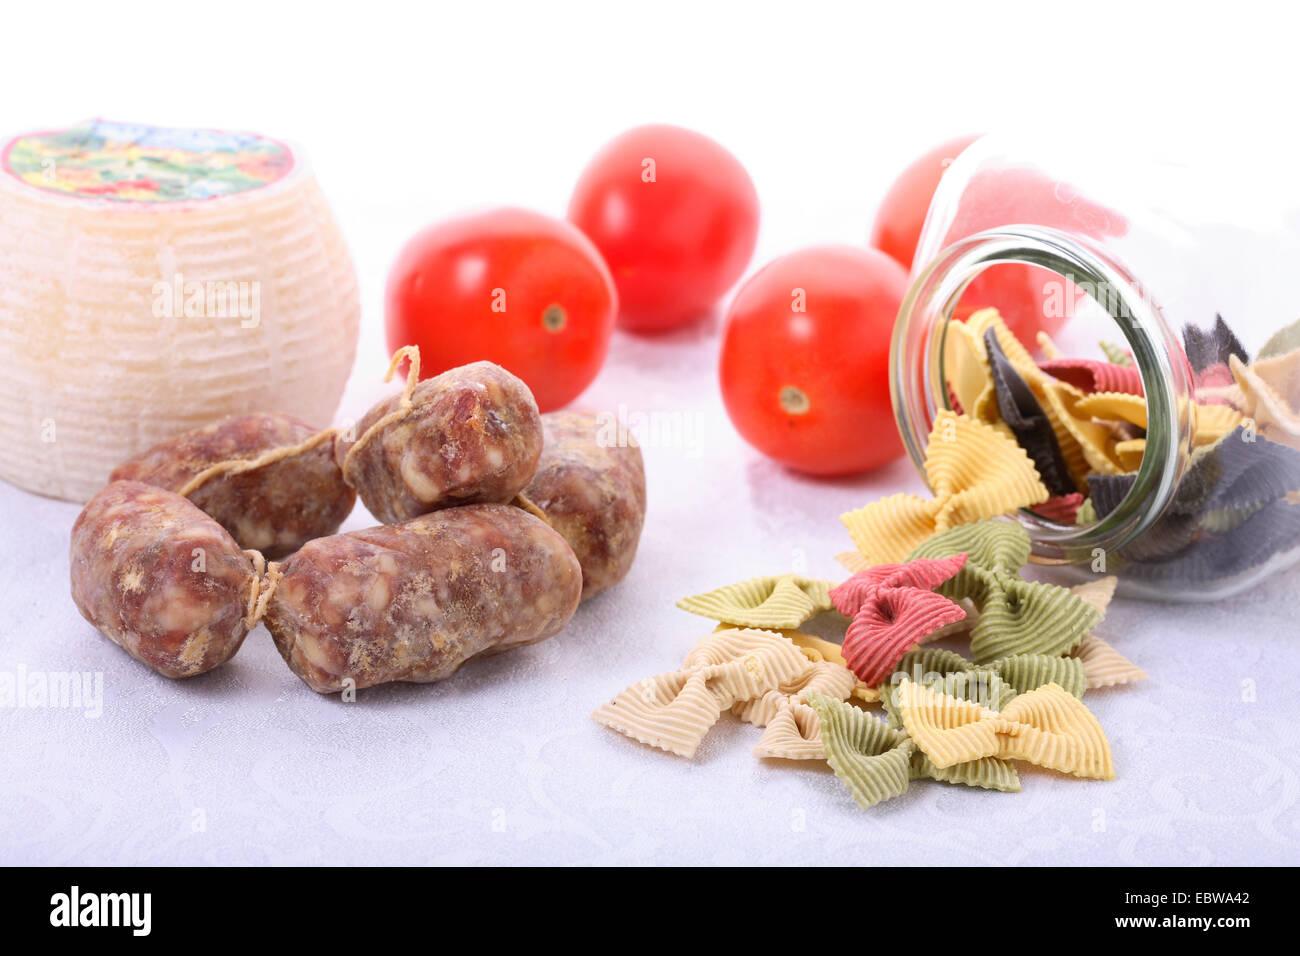 italian gastronomic specialties, salami, tomatoes and farfalle - Stock Image